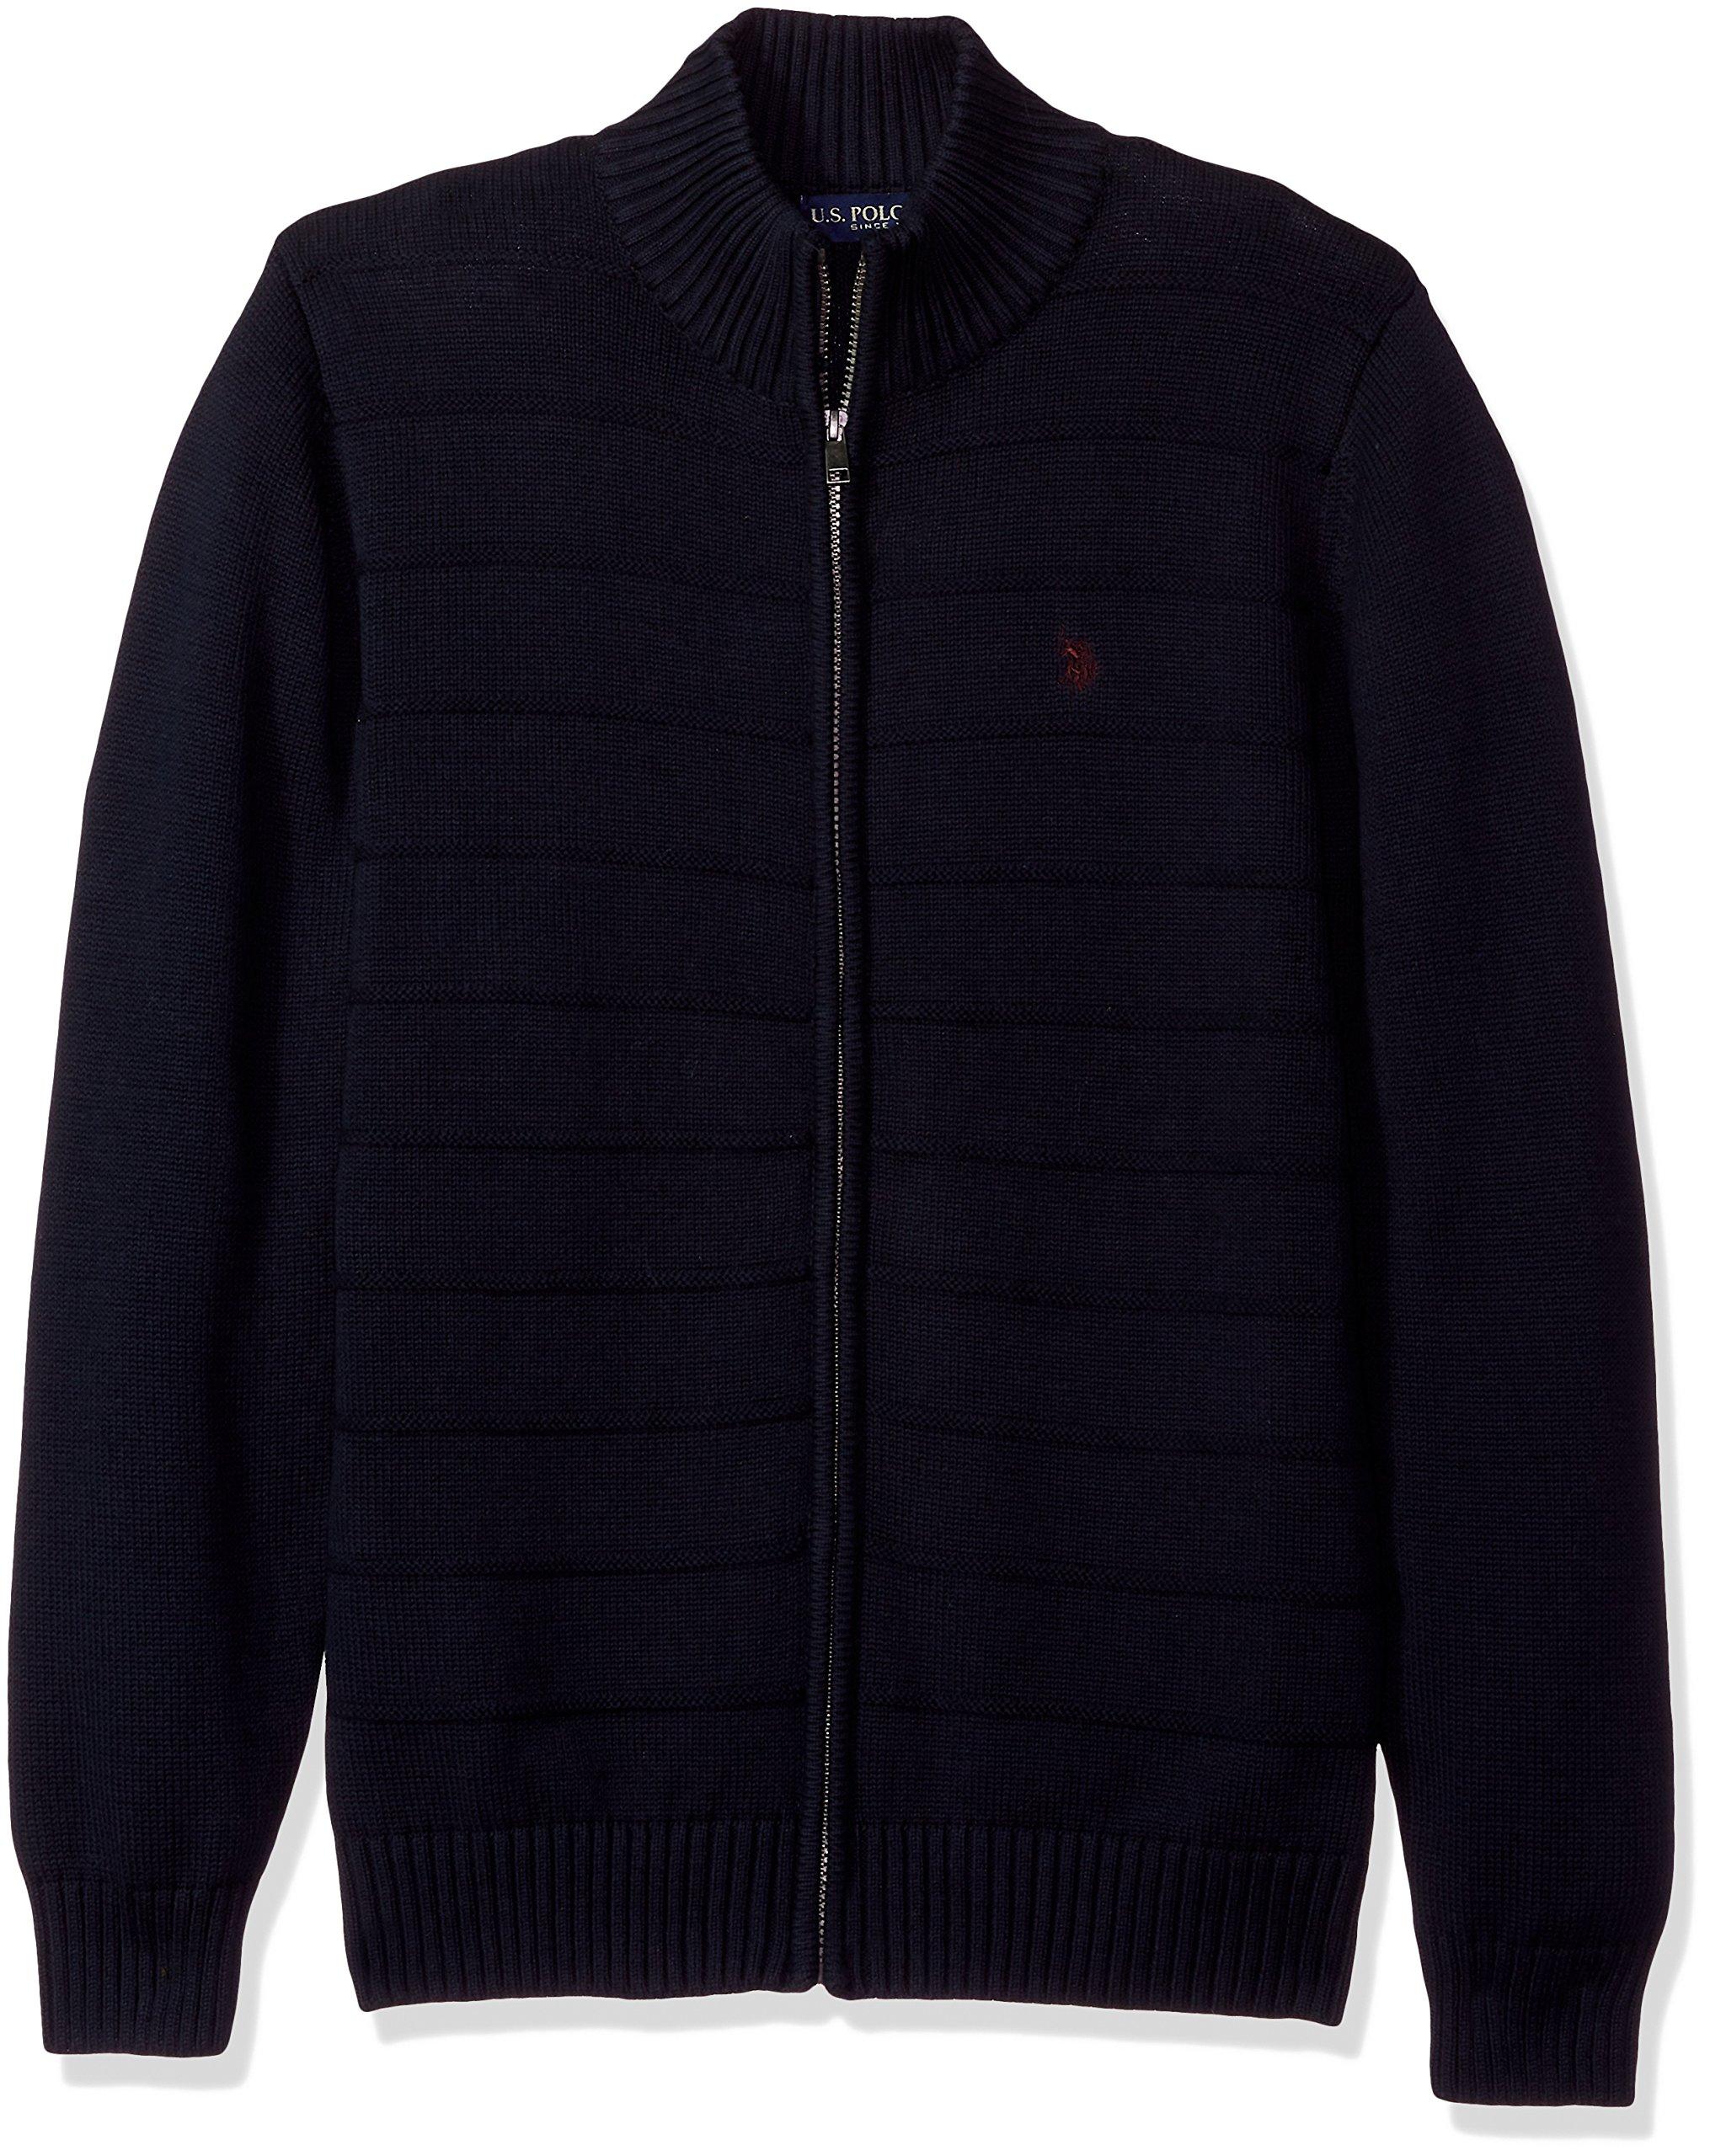 U.S. Polo Assn. Men's Texture Fine Stripe Full Zip Sweater, Navy, X-Large